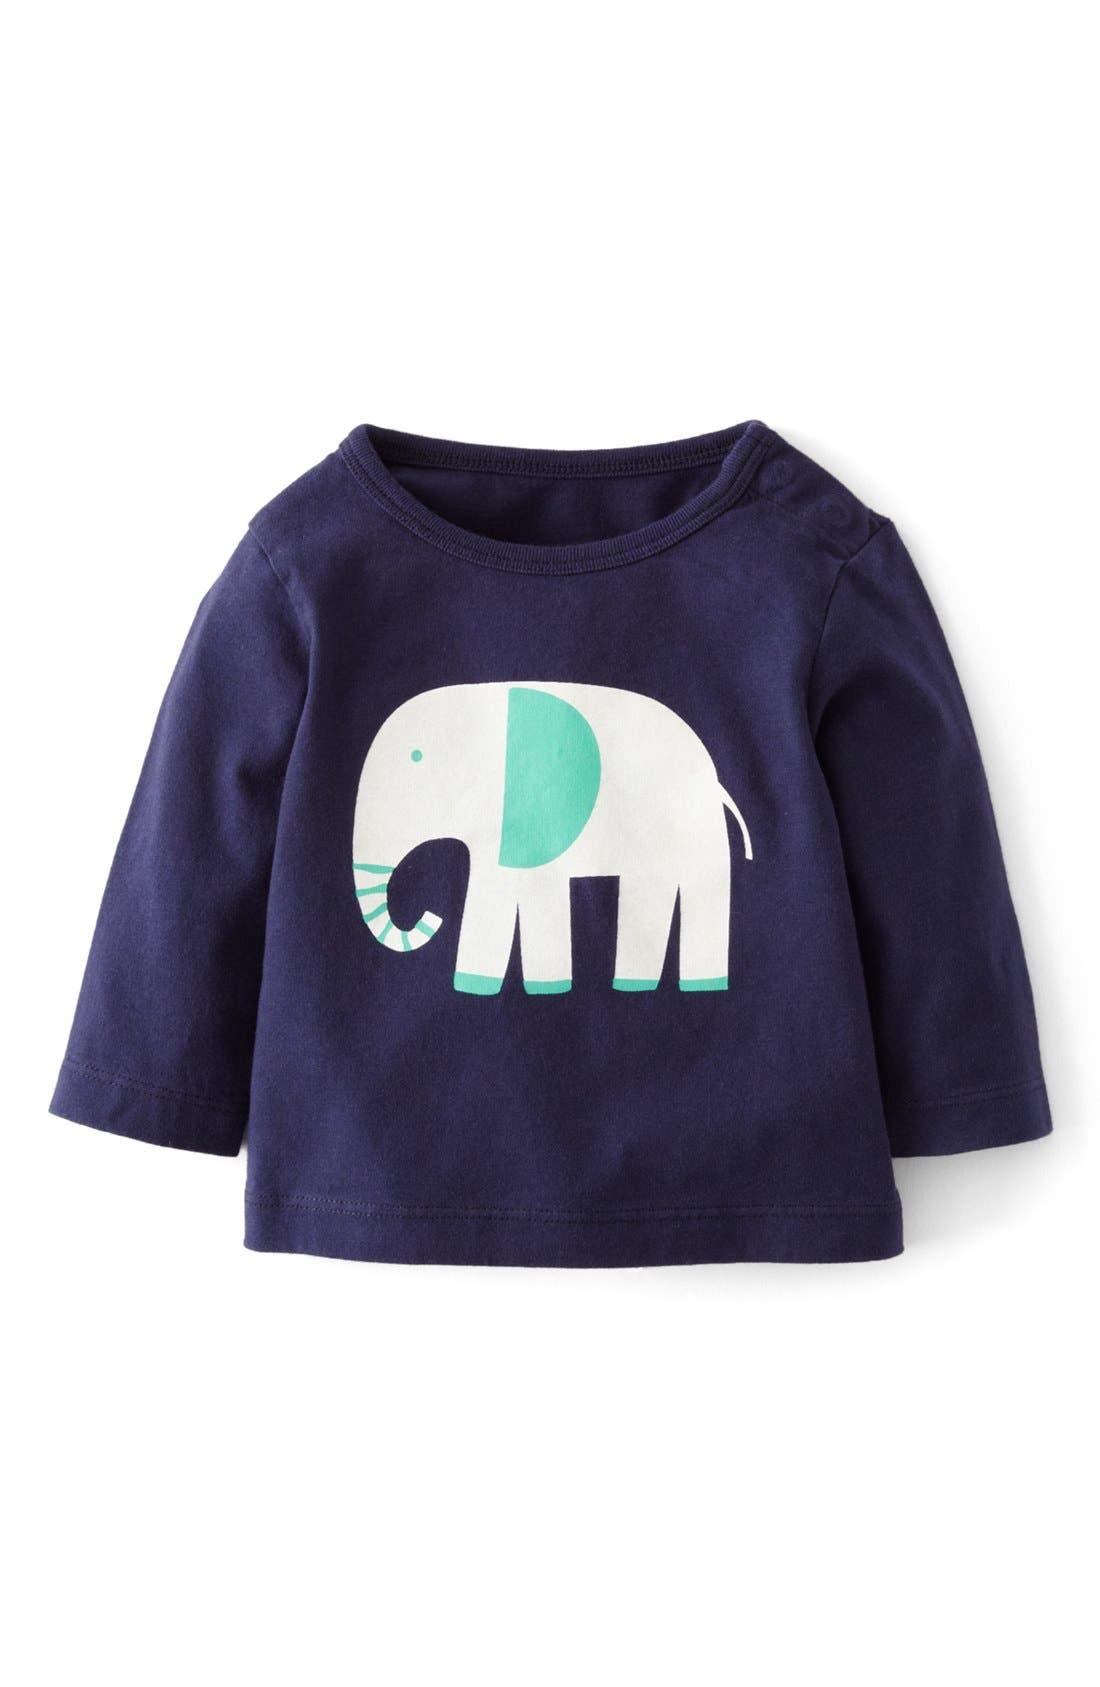 Main Image - Mini Boden 'Fun' Print Logo T-Shirt (Baby Boys)